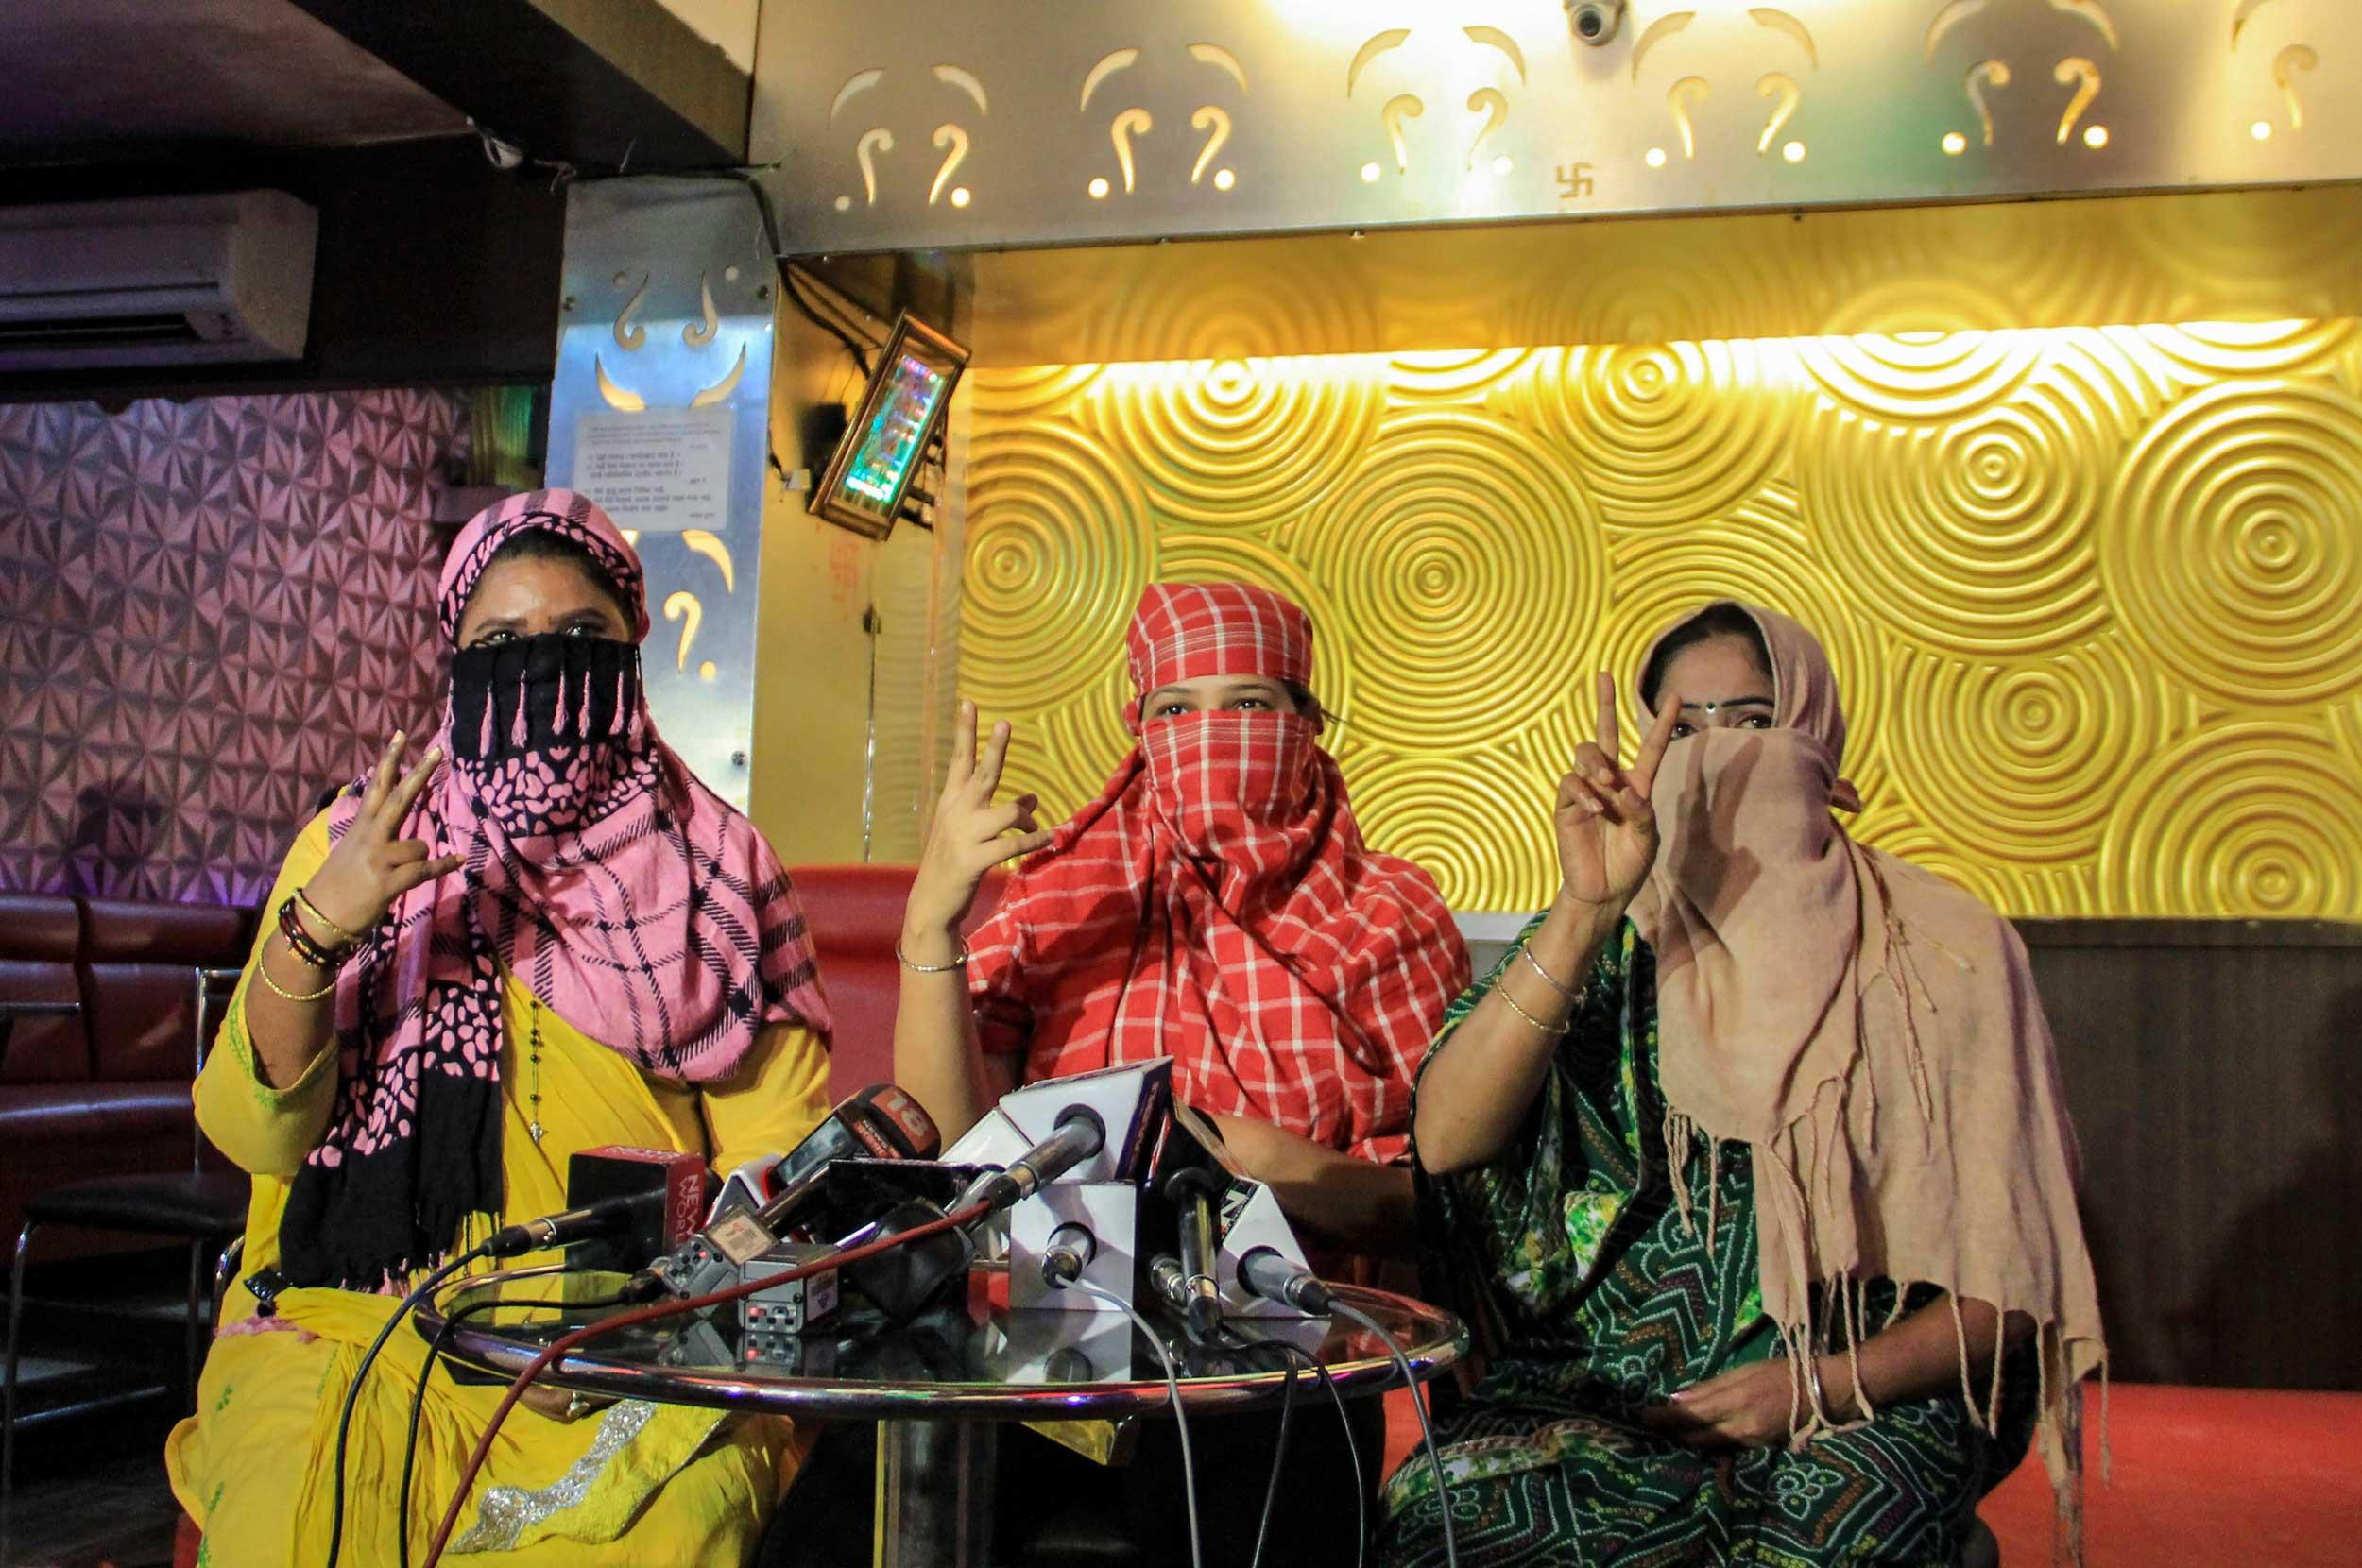 Mumbai dance bars freed of moral fetters